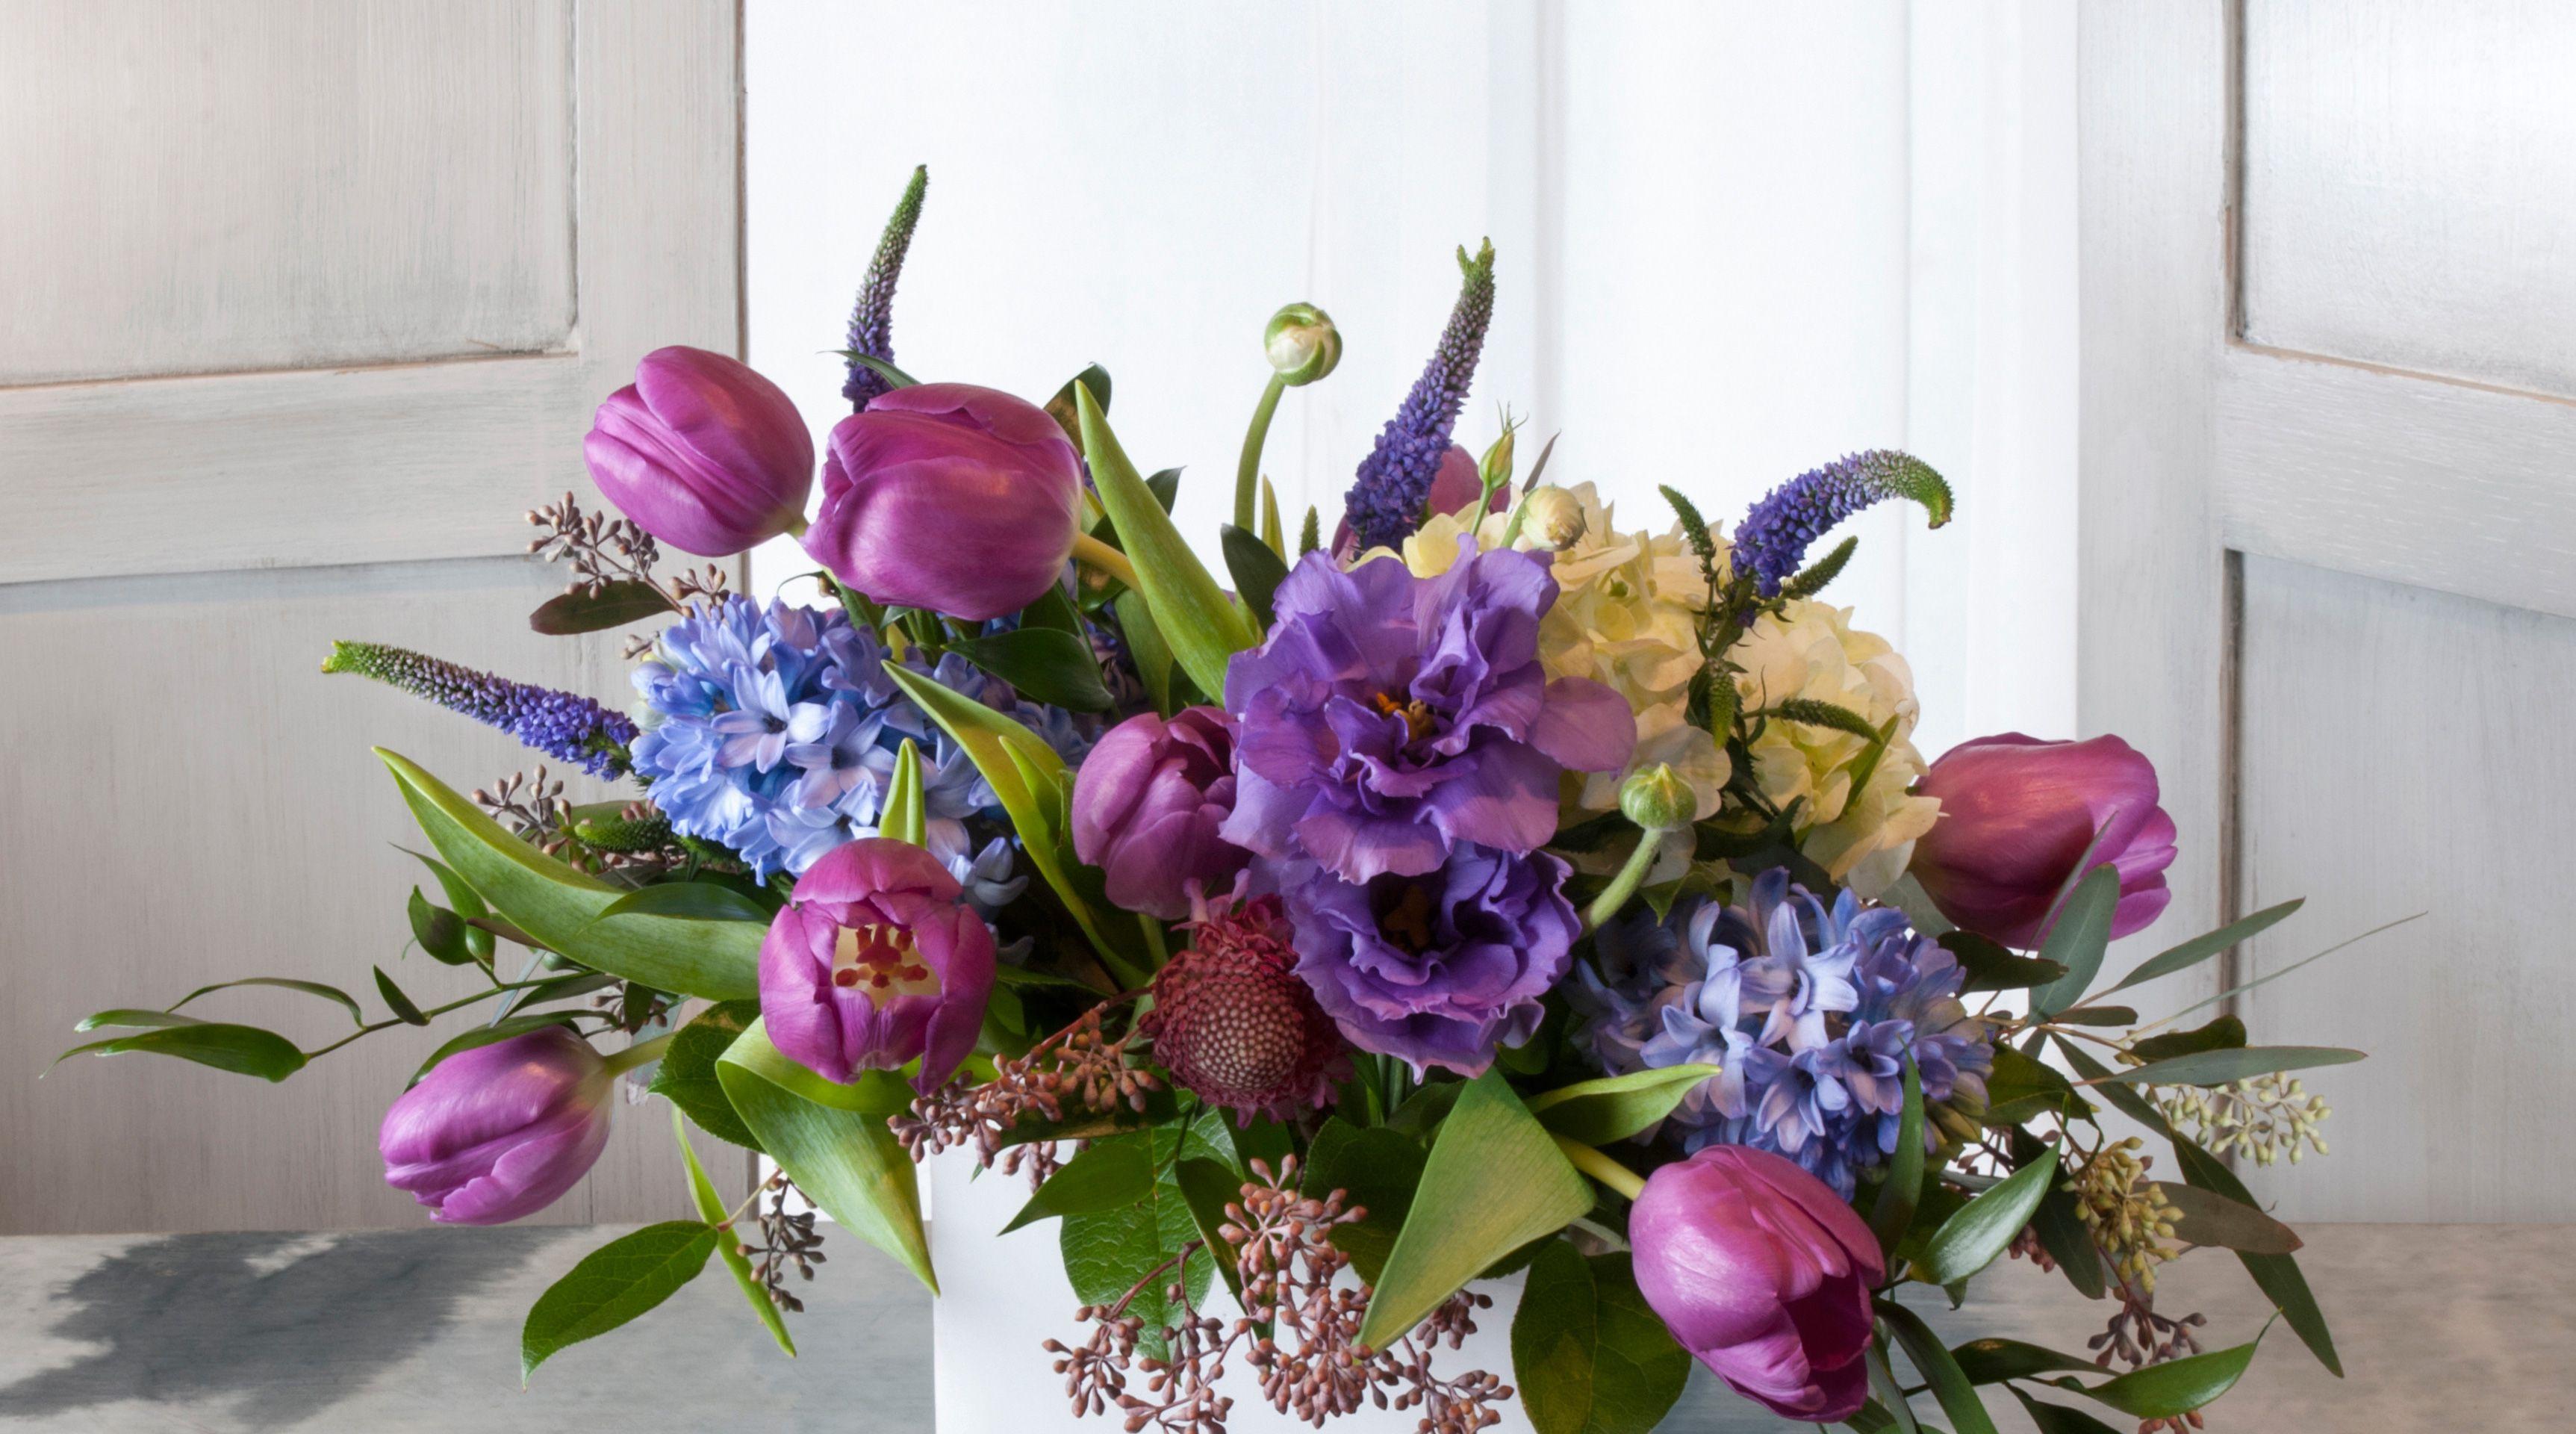 Pin by Top florist in dubai on TOP FLORIST IN DUBAI Best